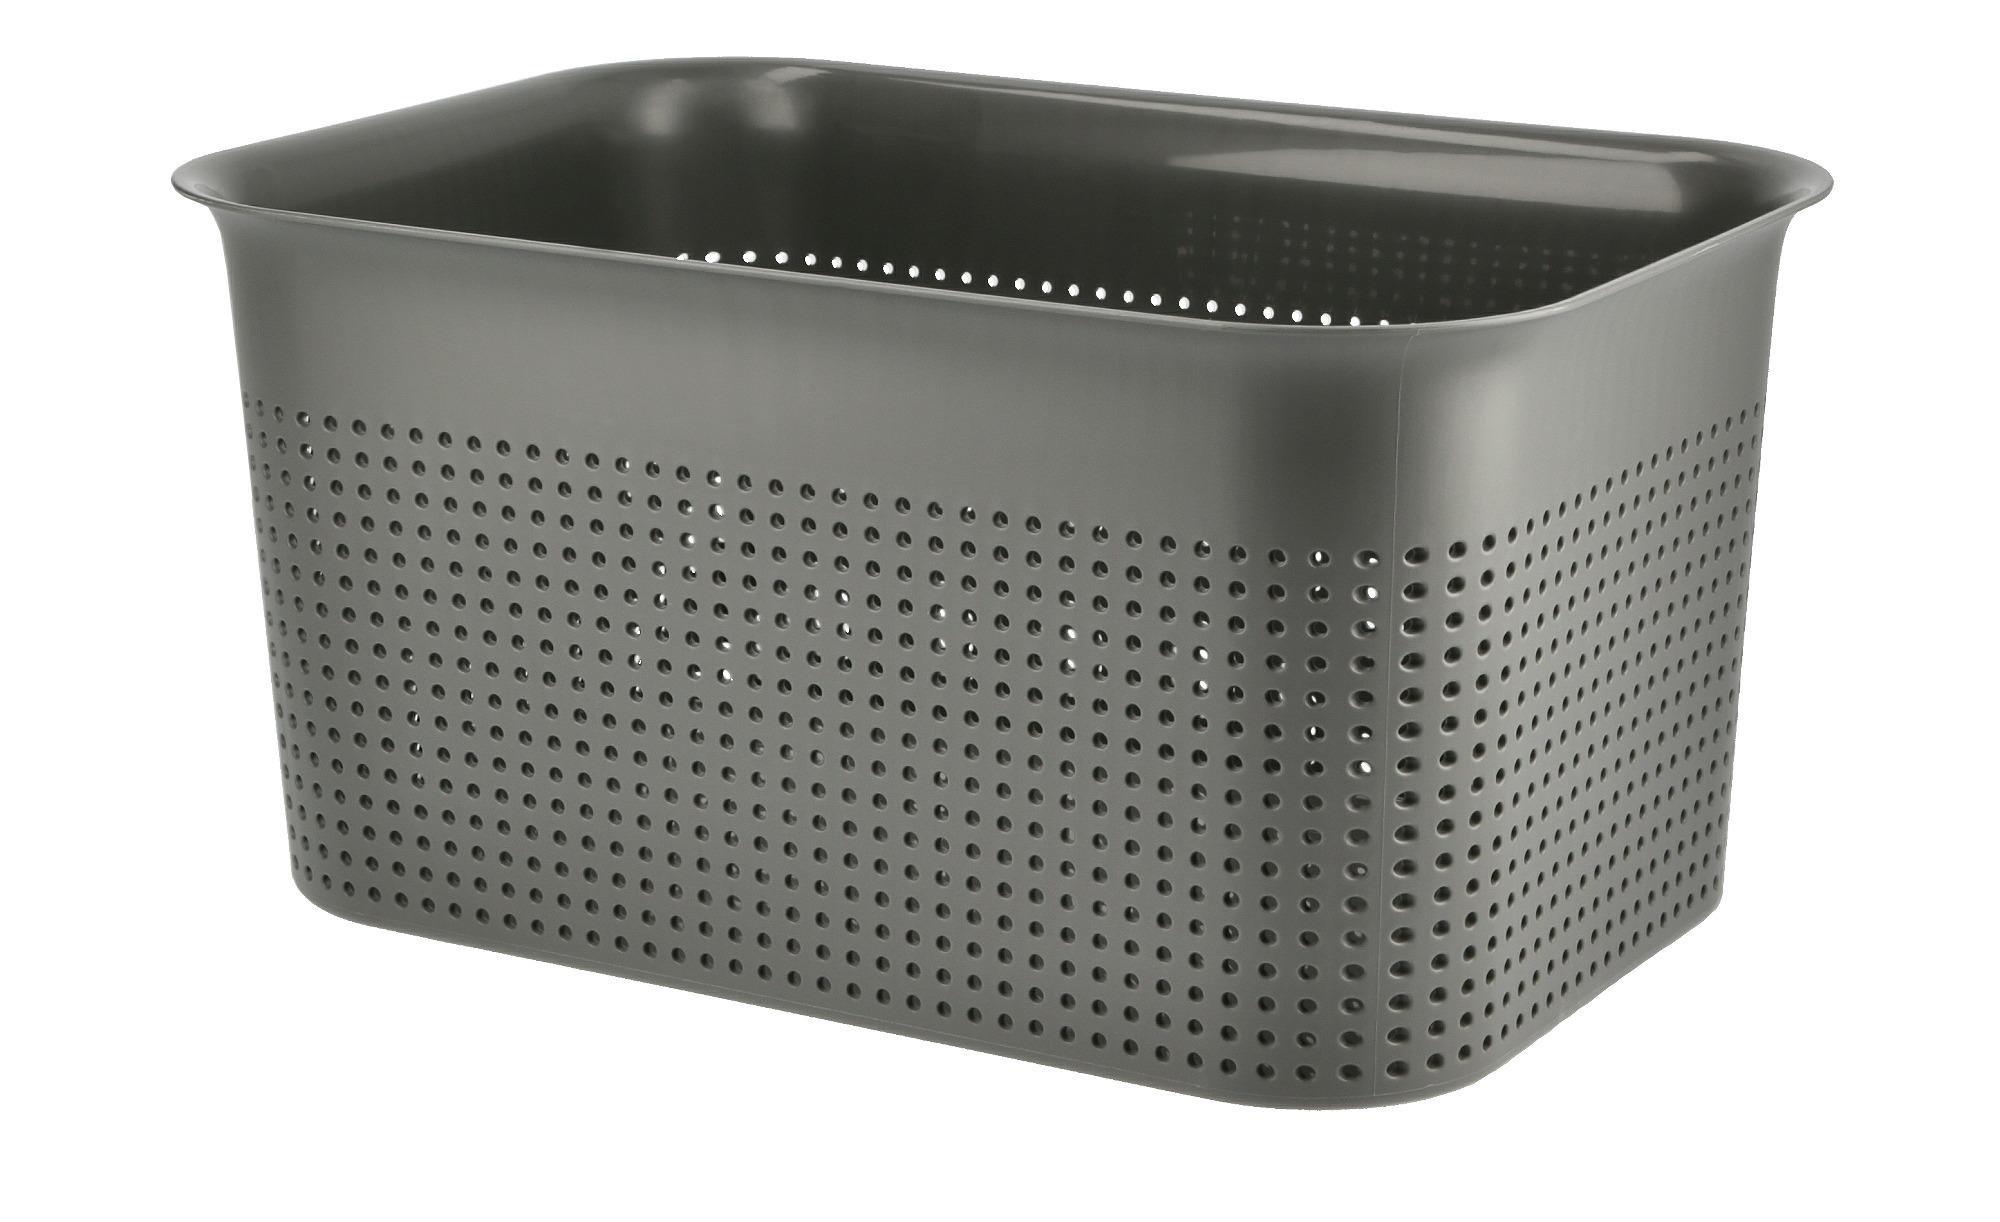 Rotho Aufbewahrungsbox ¦ grau ¦ Kunststoff Aufbewahrung > Aufbewahrungsboxen > sonstige Aufbewahrungsmittel - Höffner